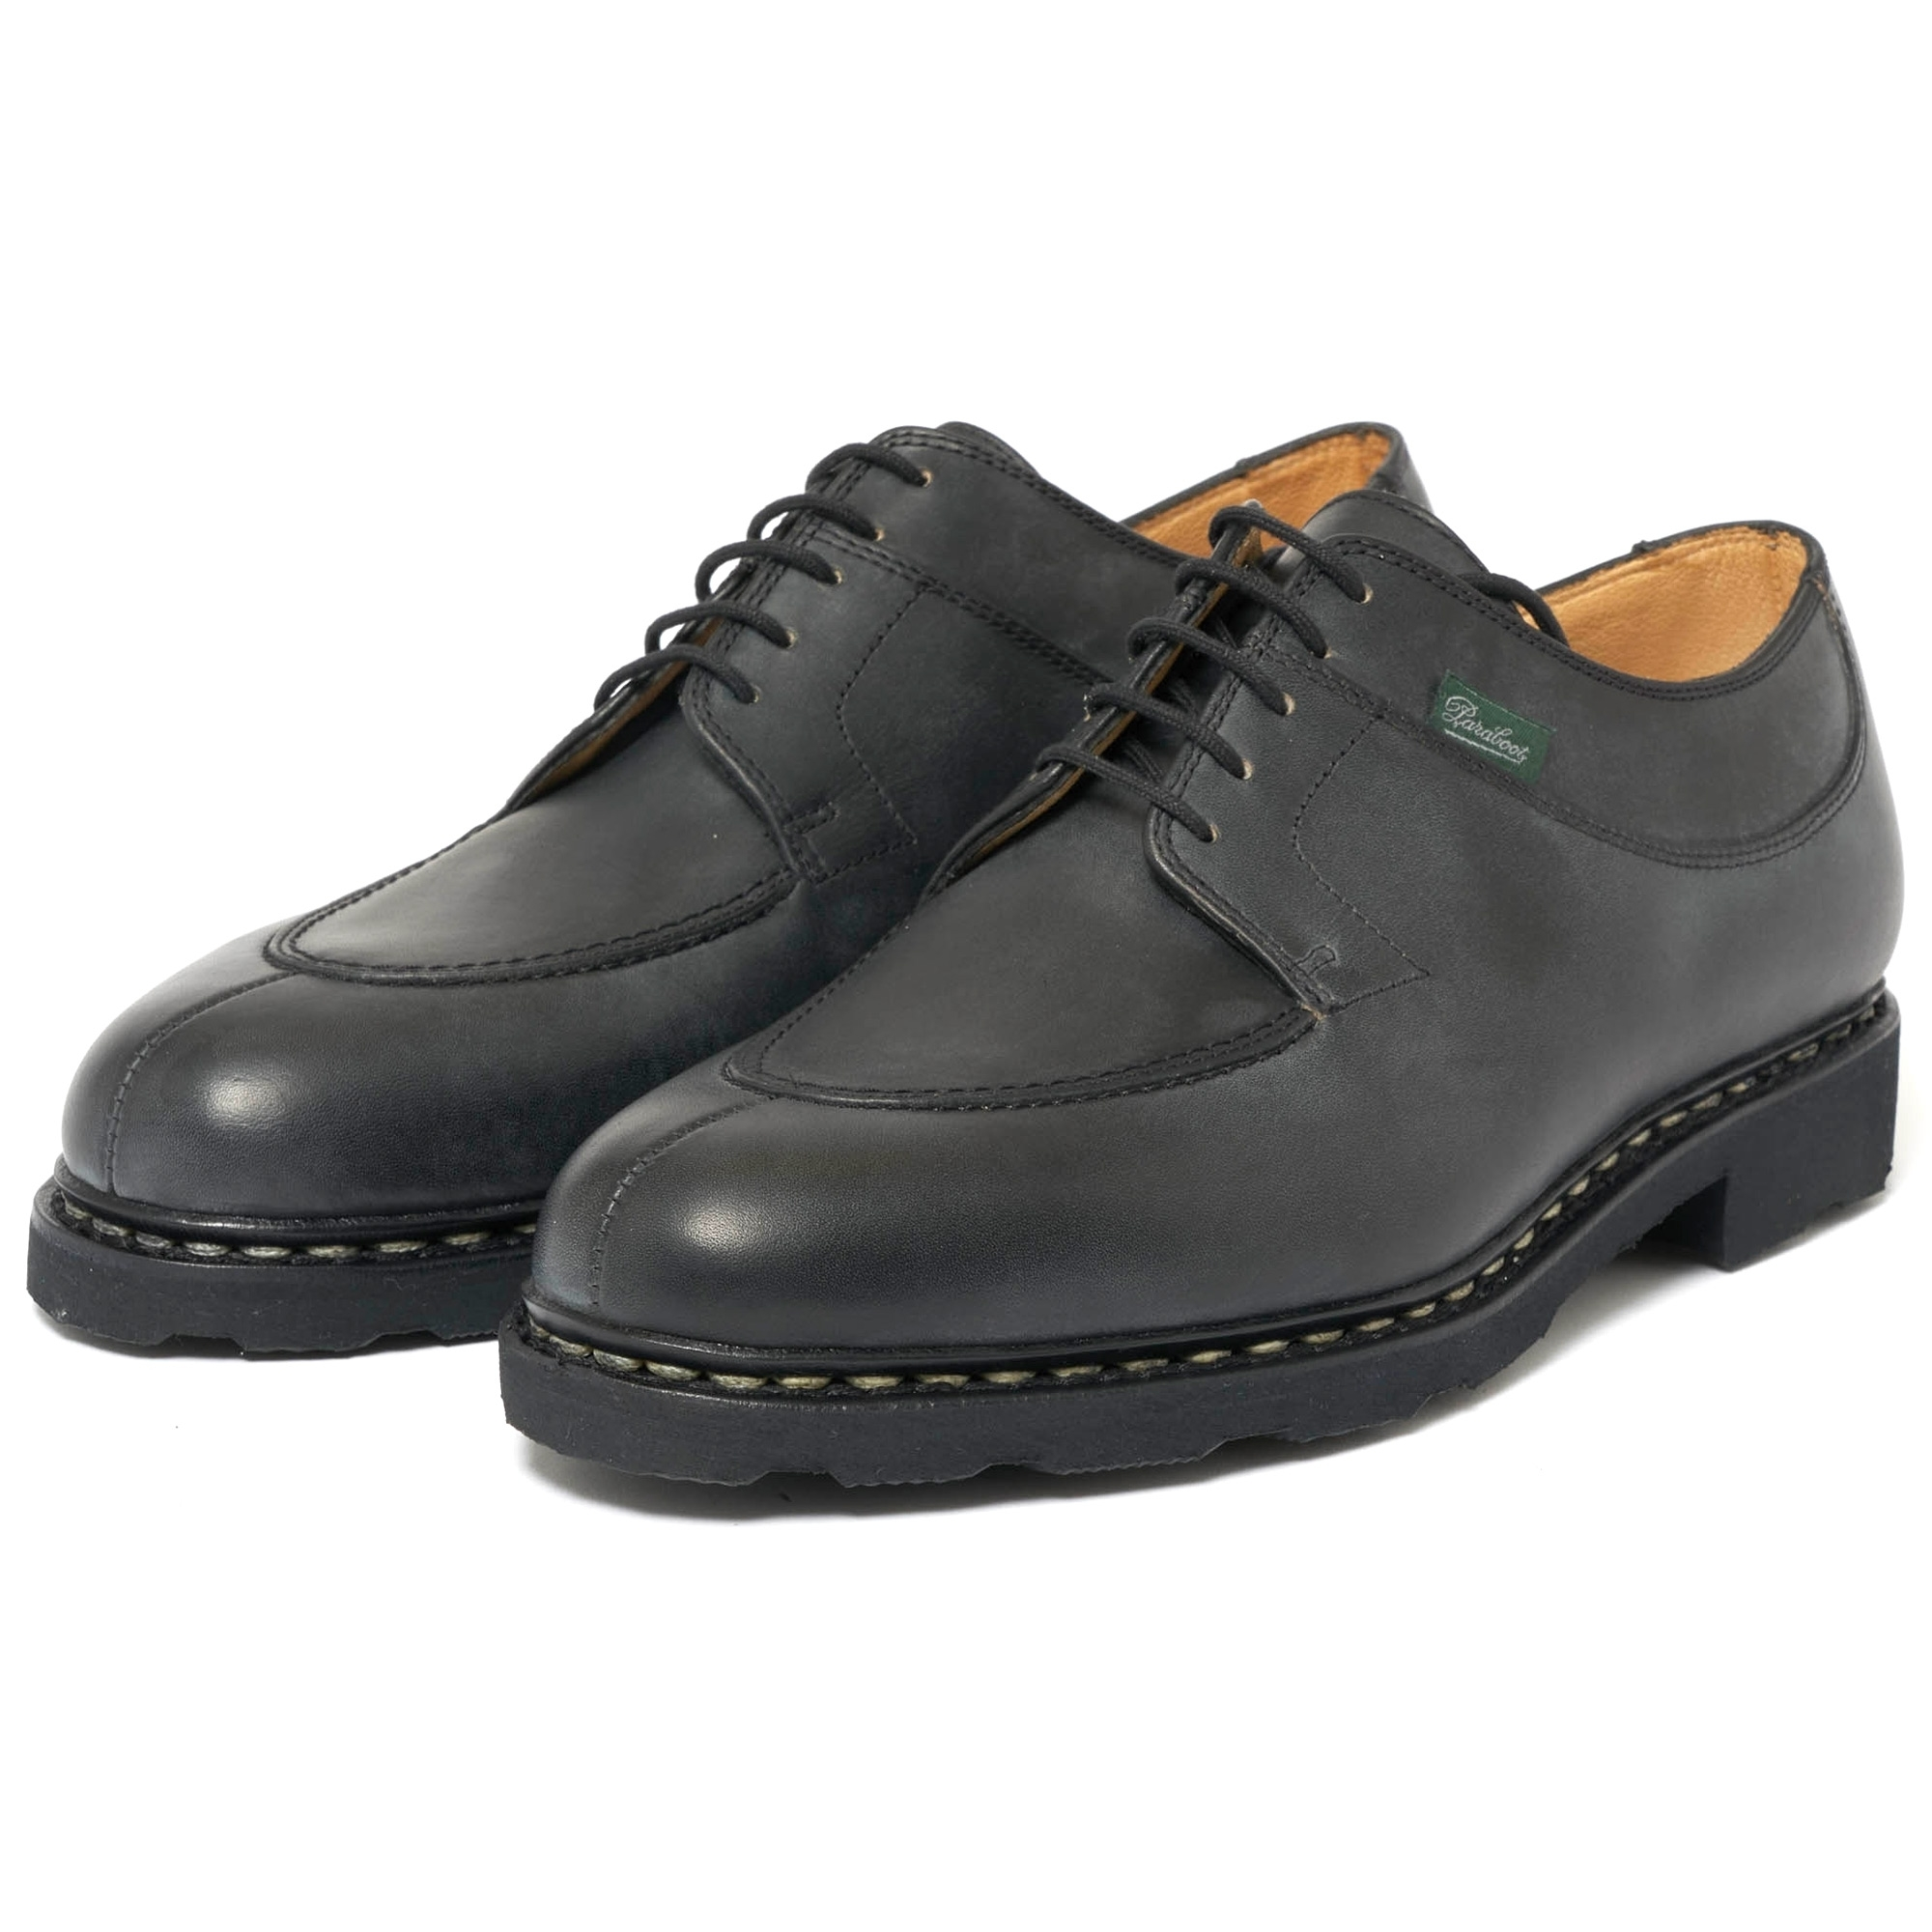 Paraboot Avignon II Shoe